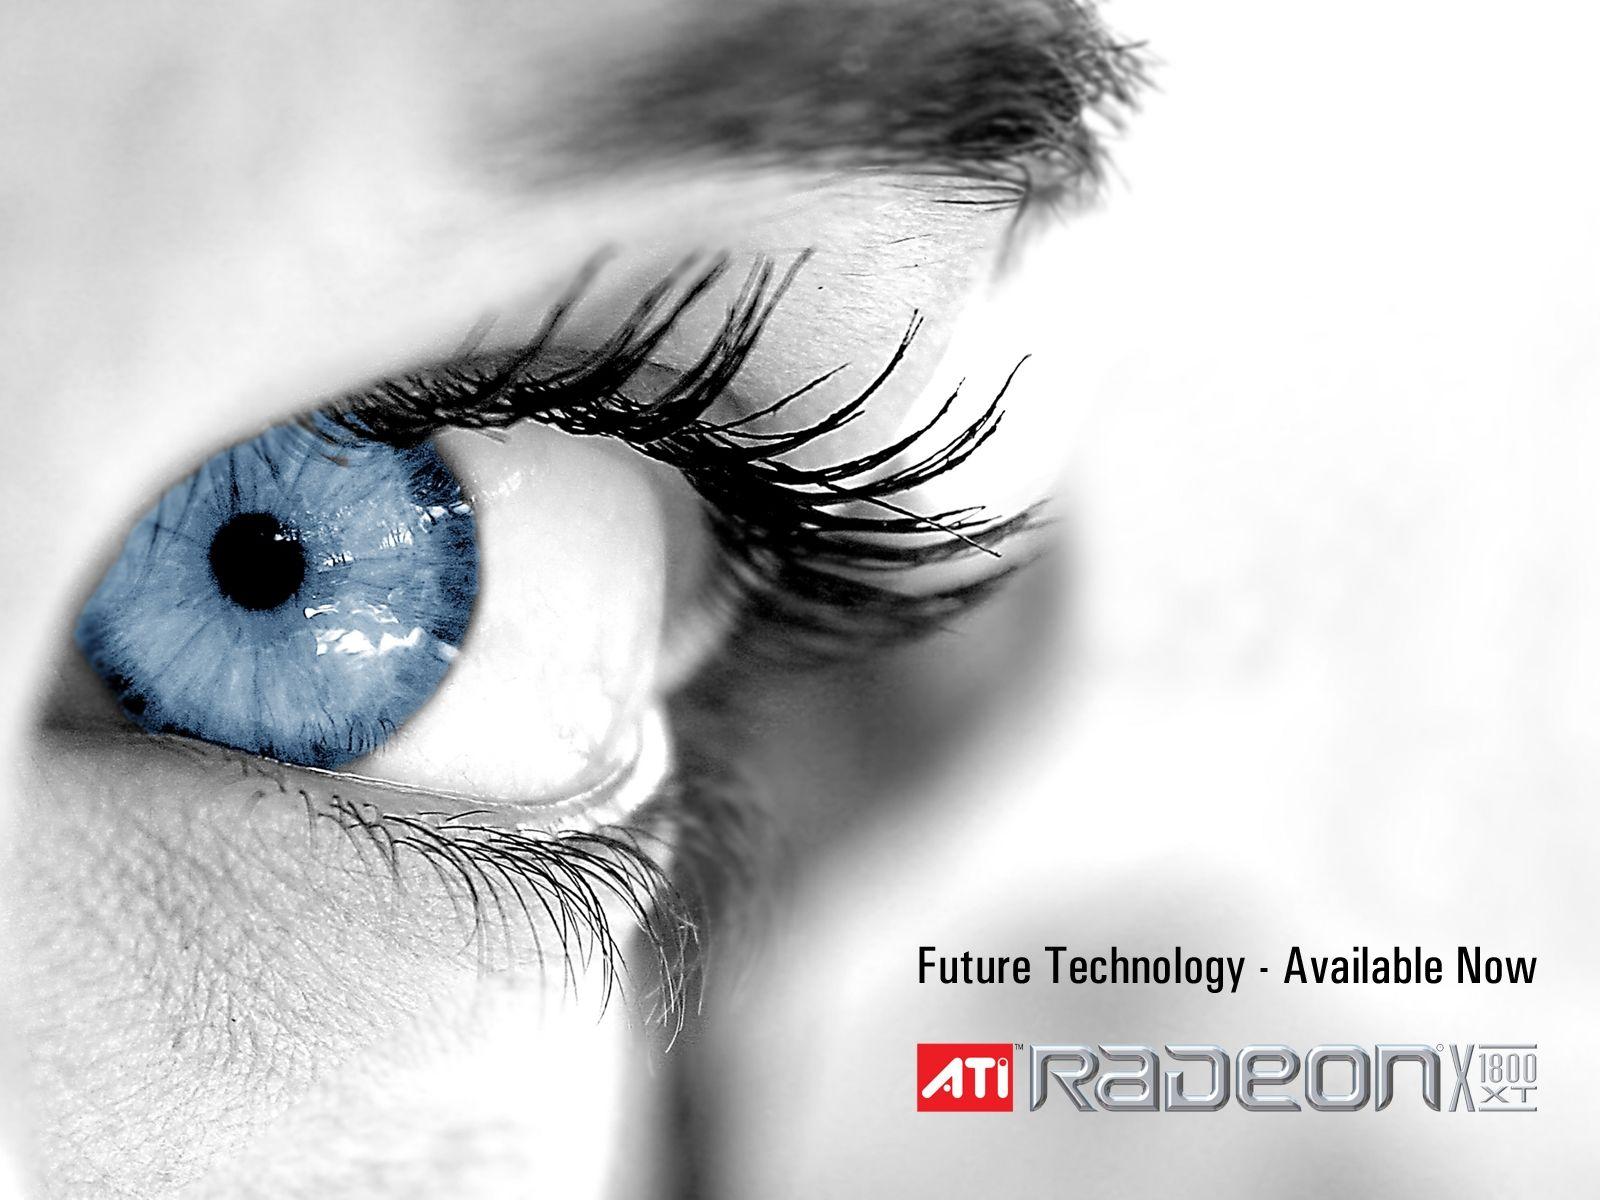 Blue Eye Radeon